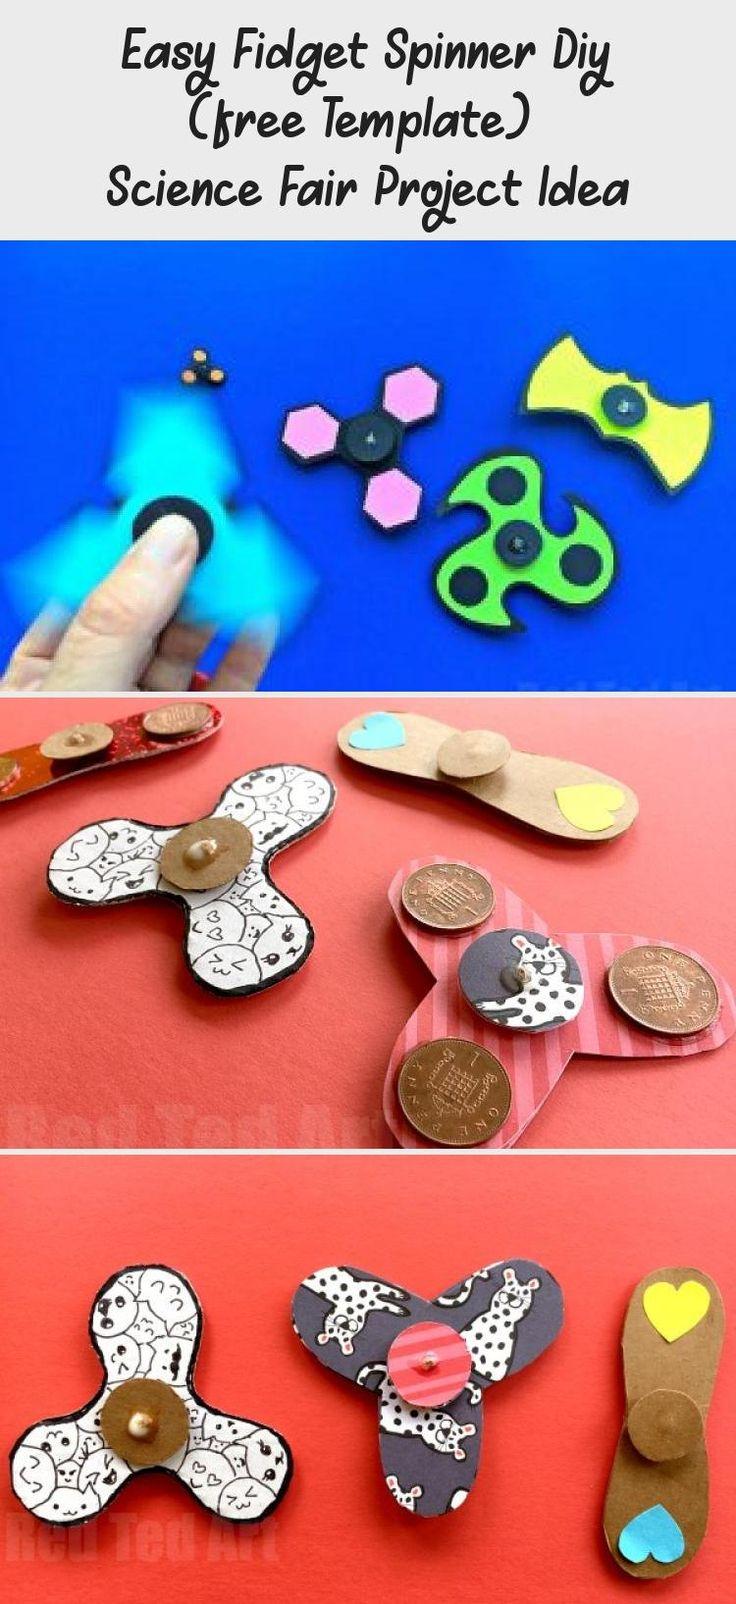 Easy fidget spinner diy free template science fair